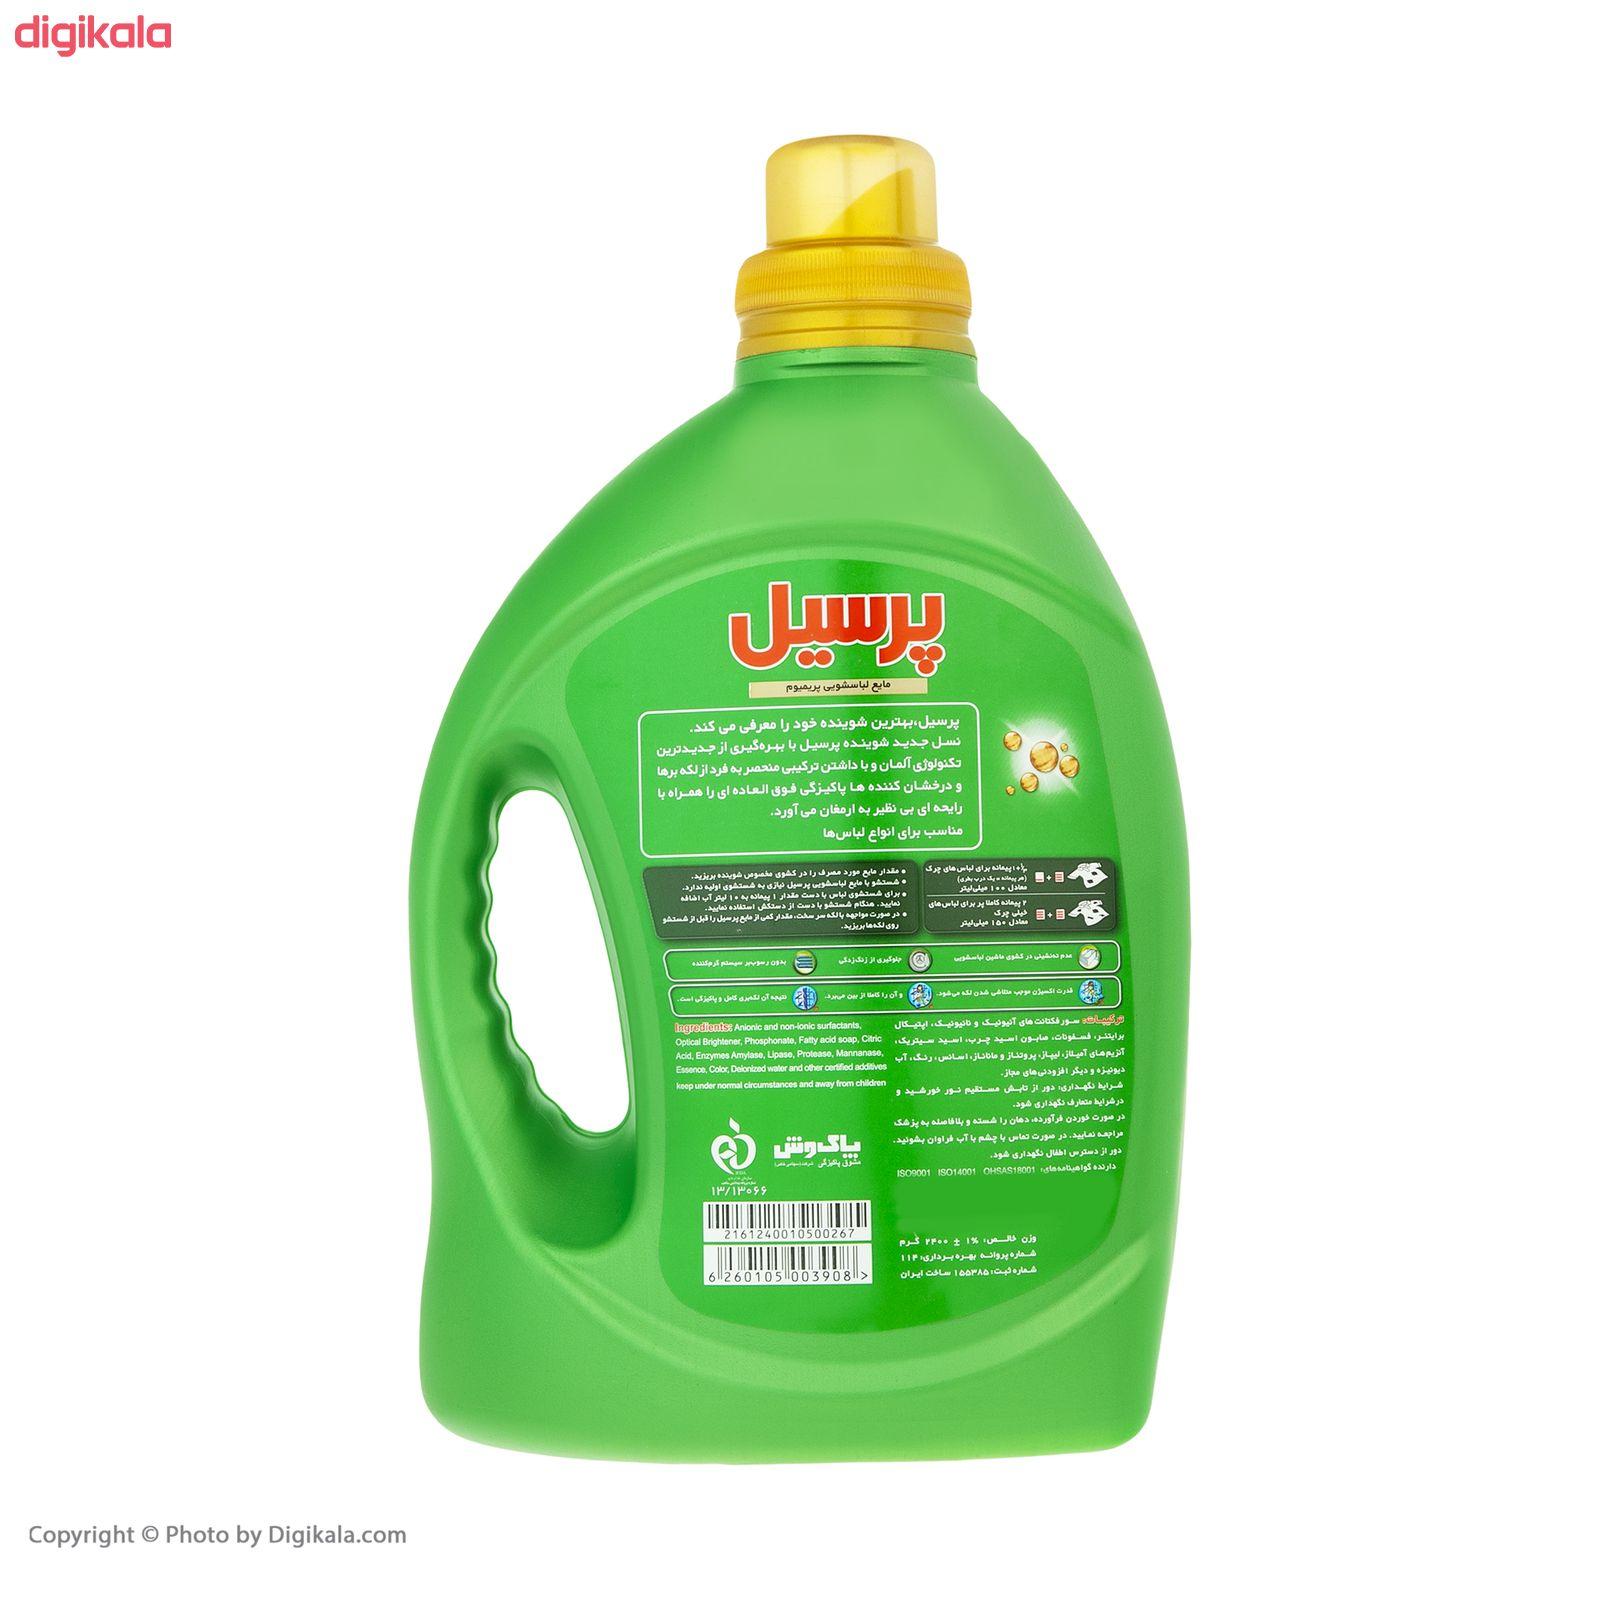 مایع لباسشویی پرسیل مدل پریمیوم مقدار 2.4 کیلوگرم main 1 2